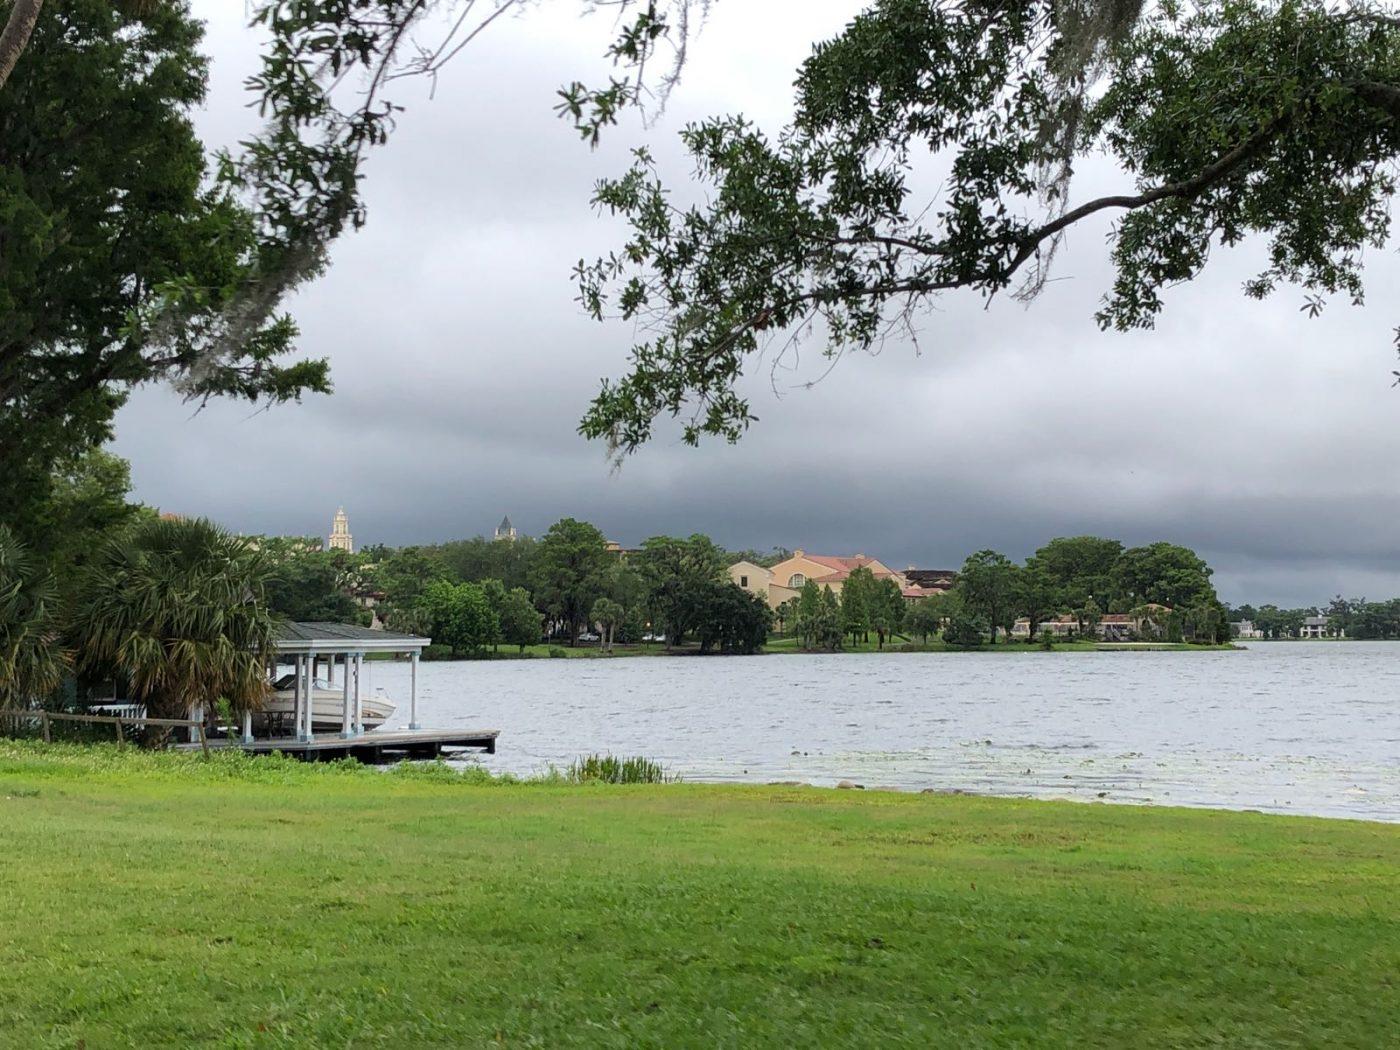 Winter Park, Florida 7